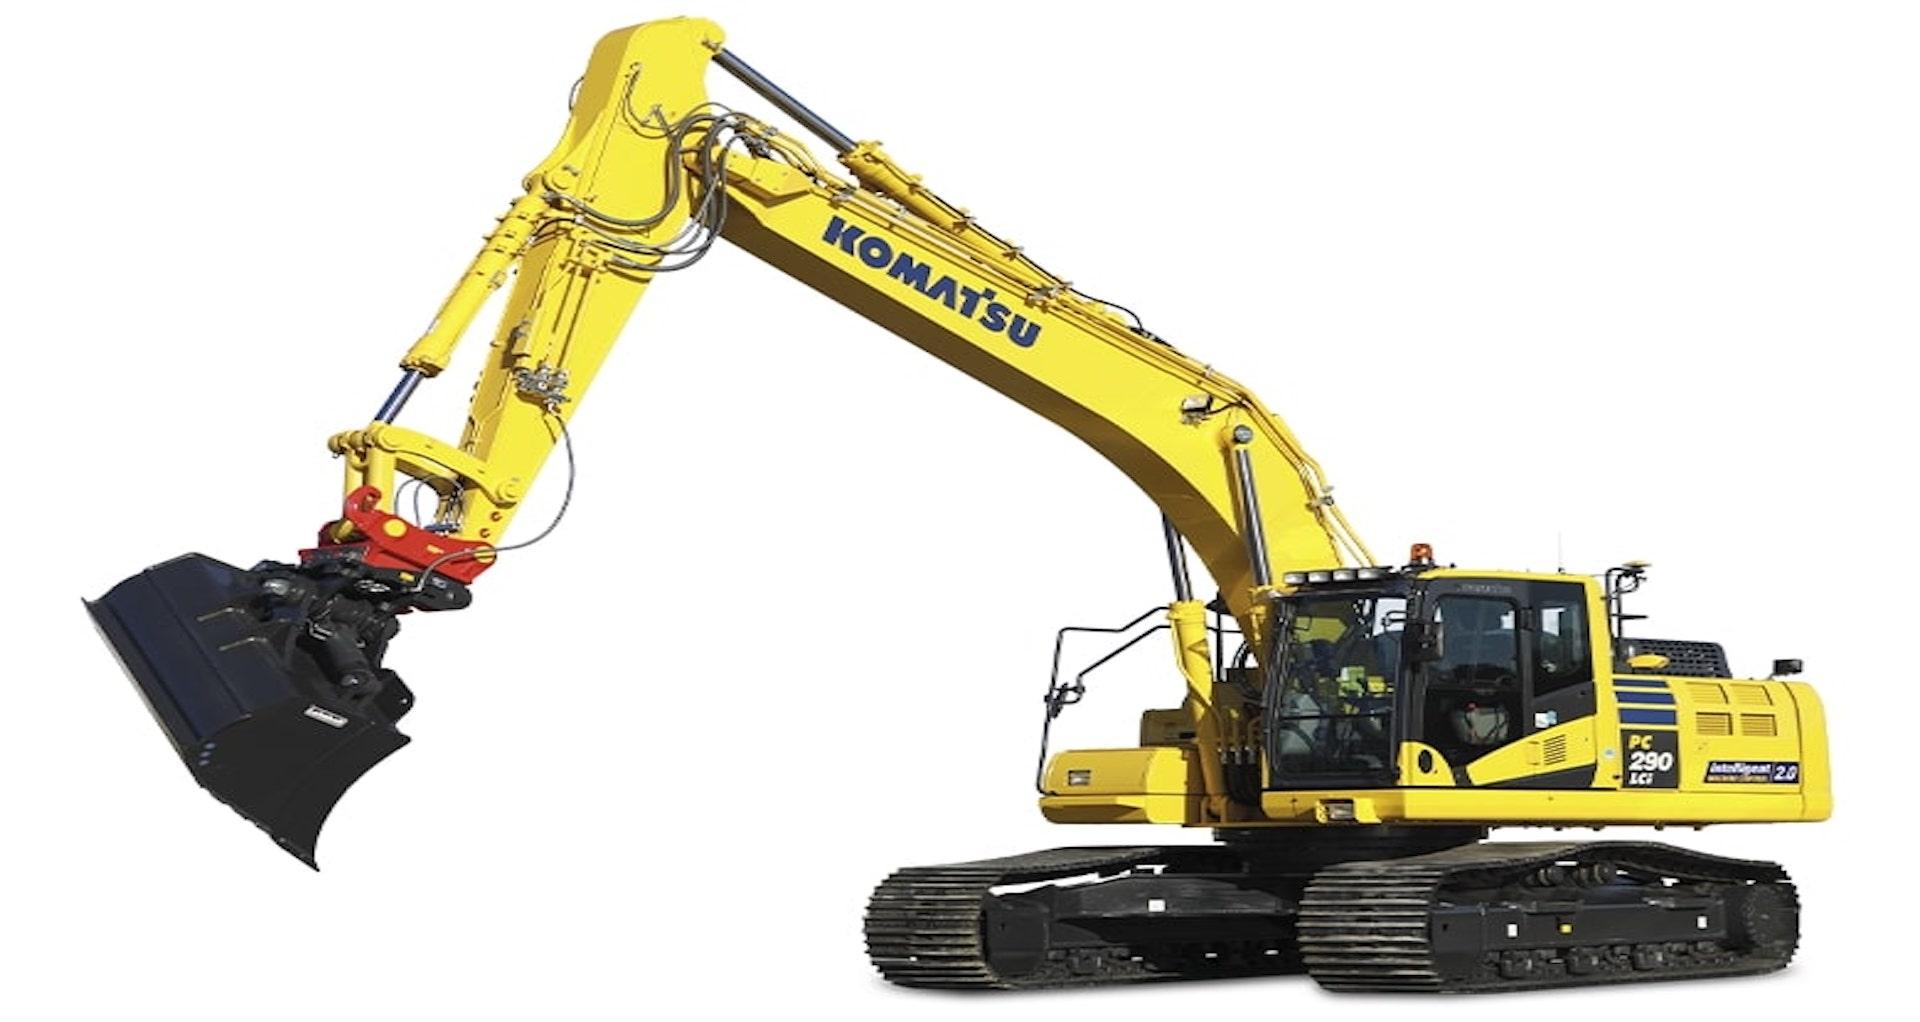 Escavatore cingolato Intelligent Komatsu PC290LCi/NLCi-11